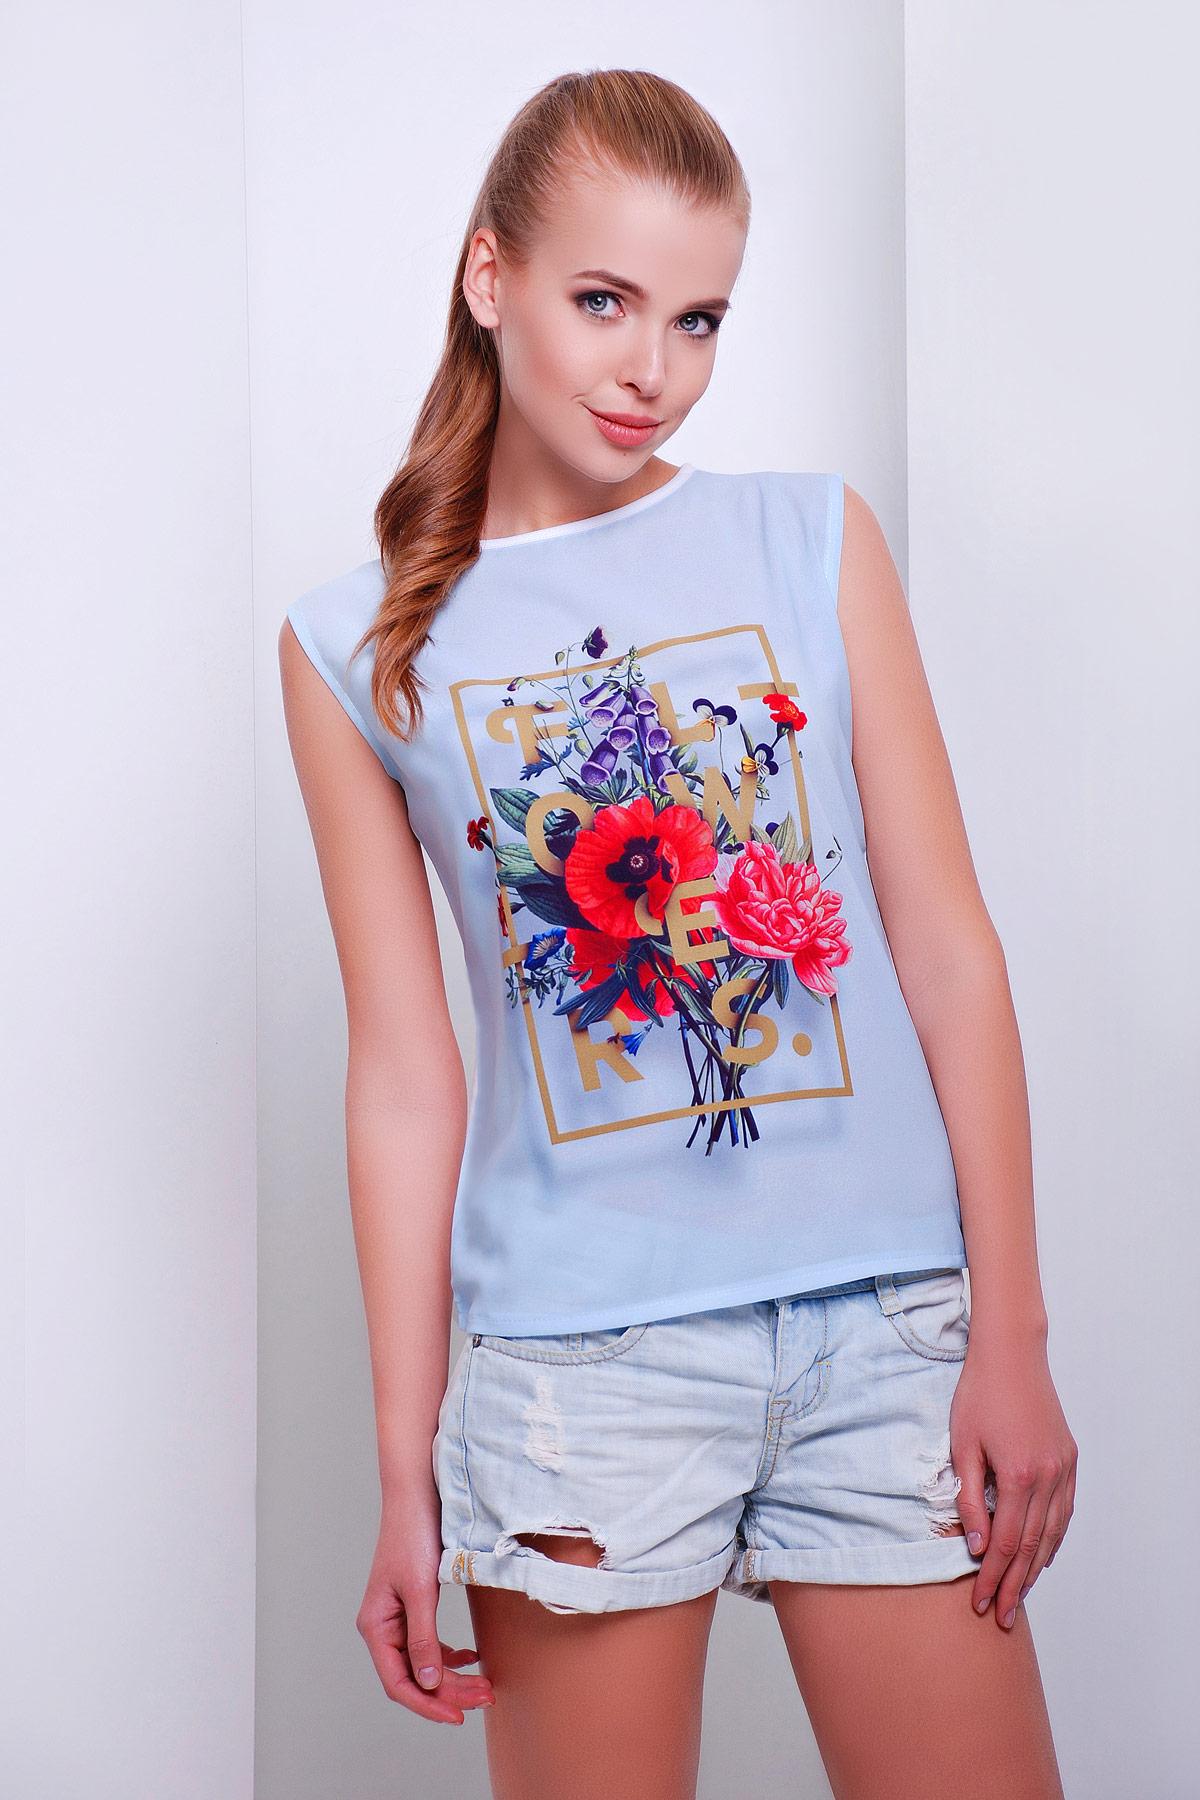 Flowers футболка Киви-Б. Цвет: принт